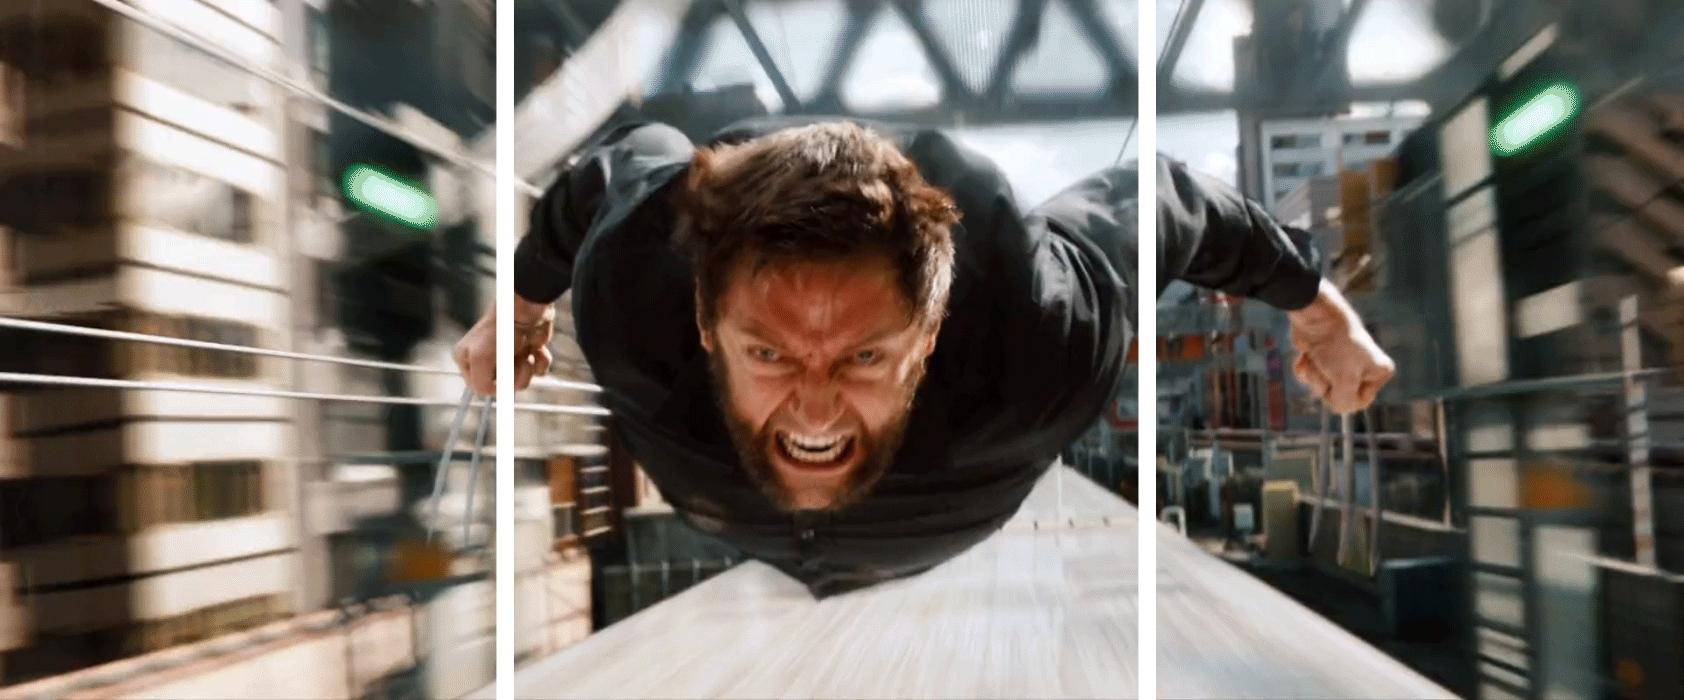 SplitDepthGIFS, splitdepthgifs, Wolverines coming for your upvotes (reddit) GIFs